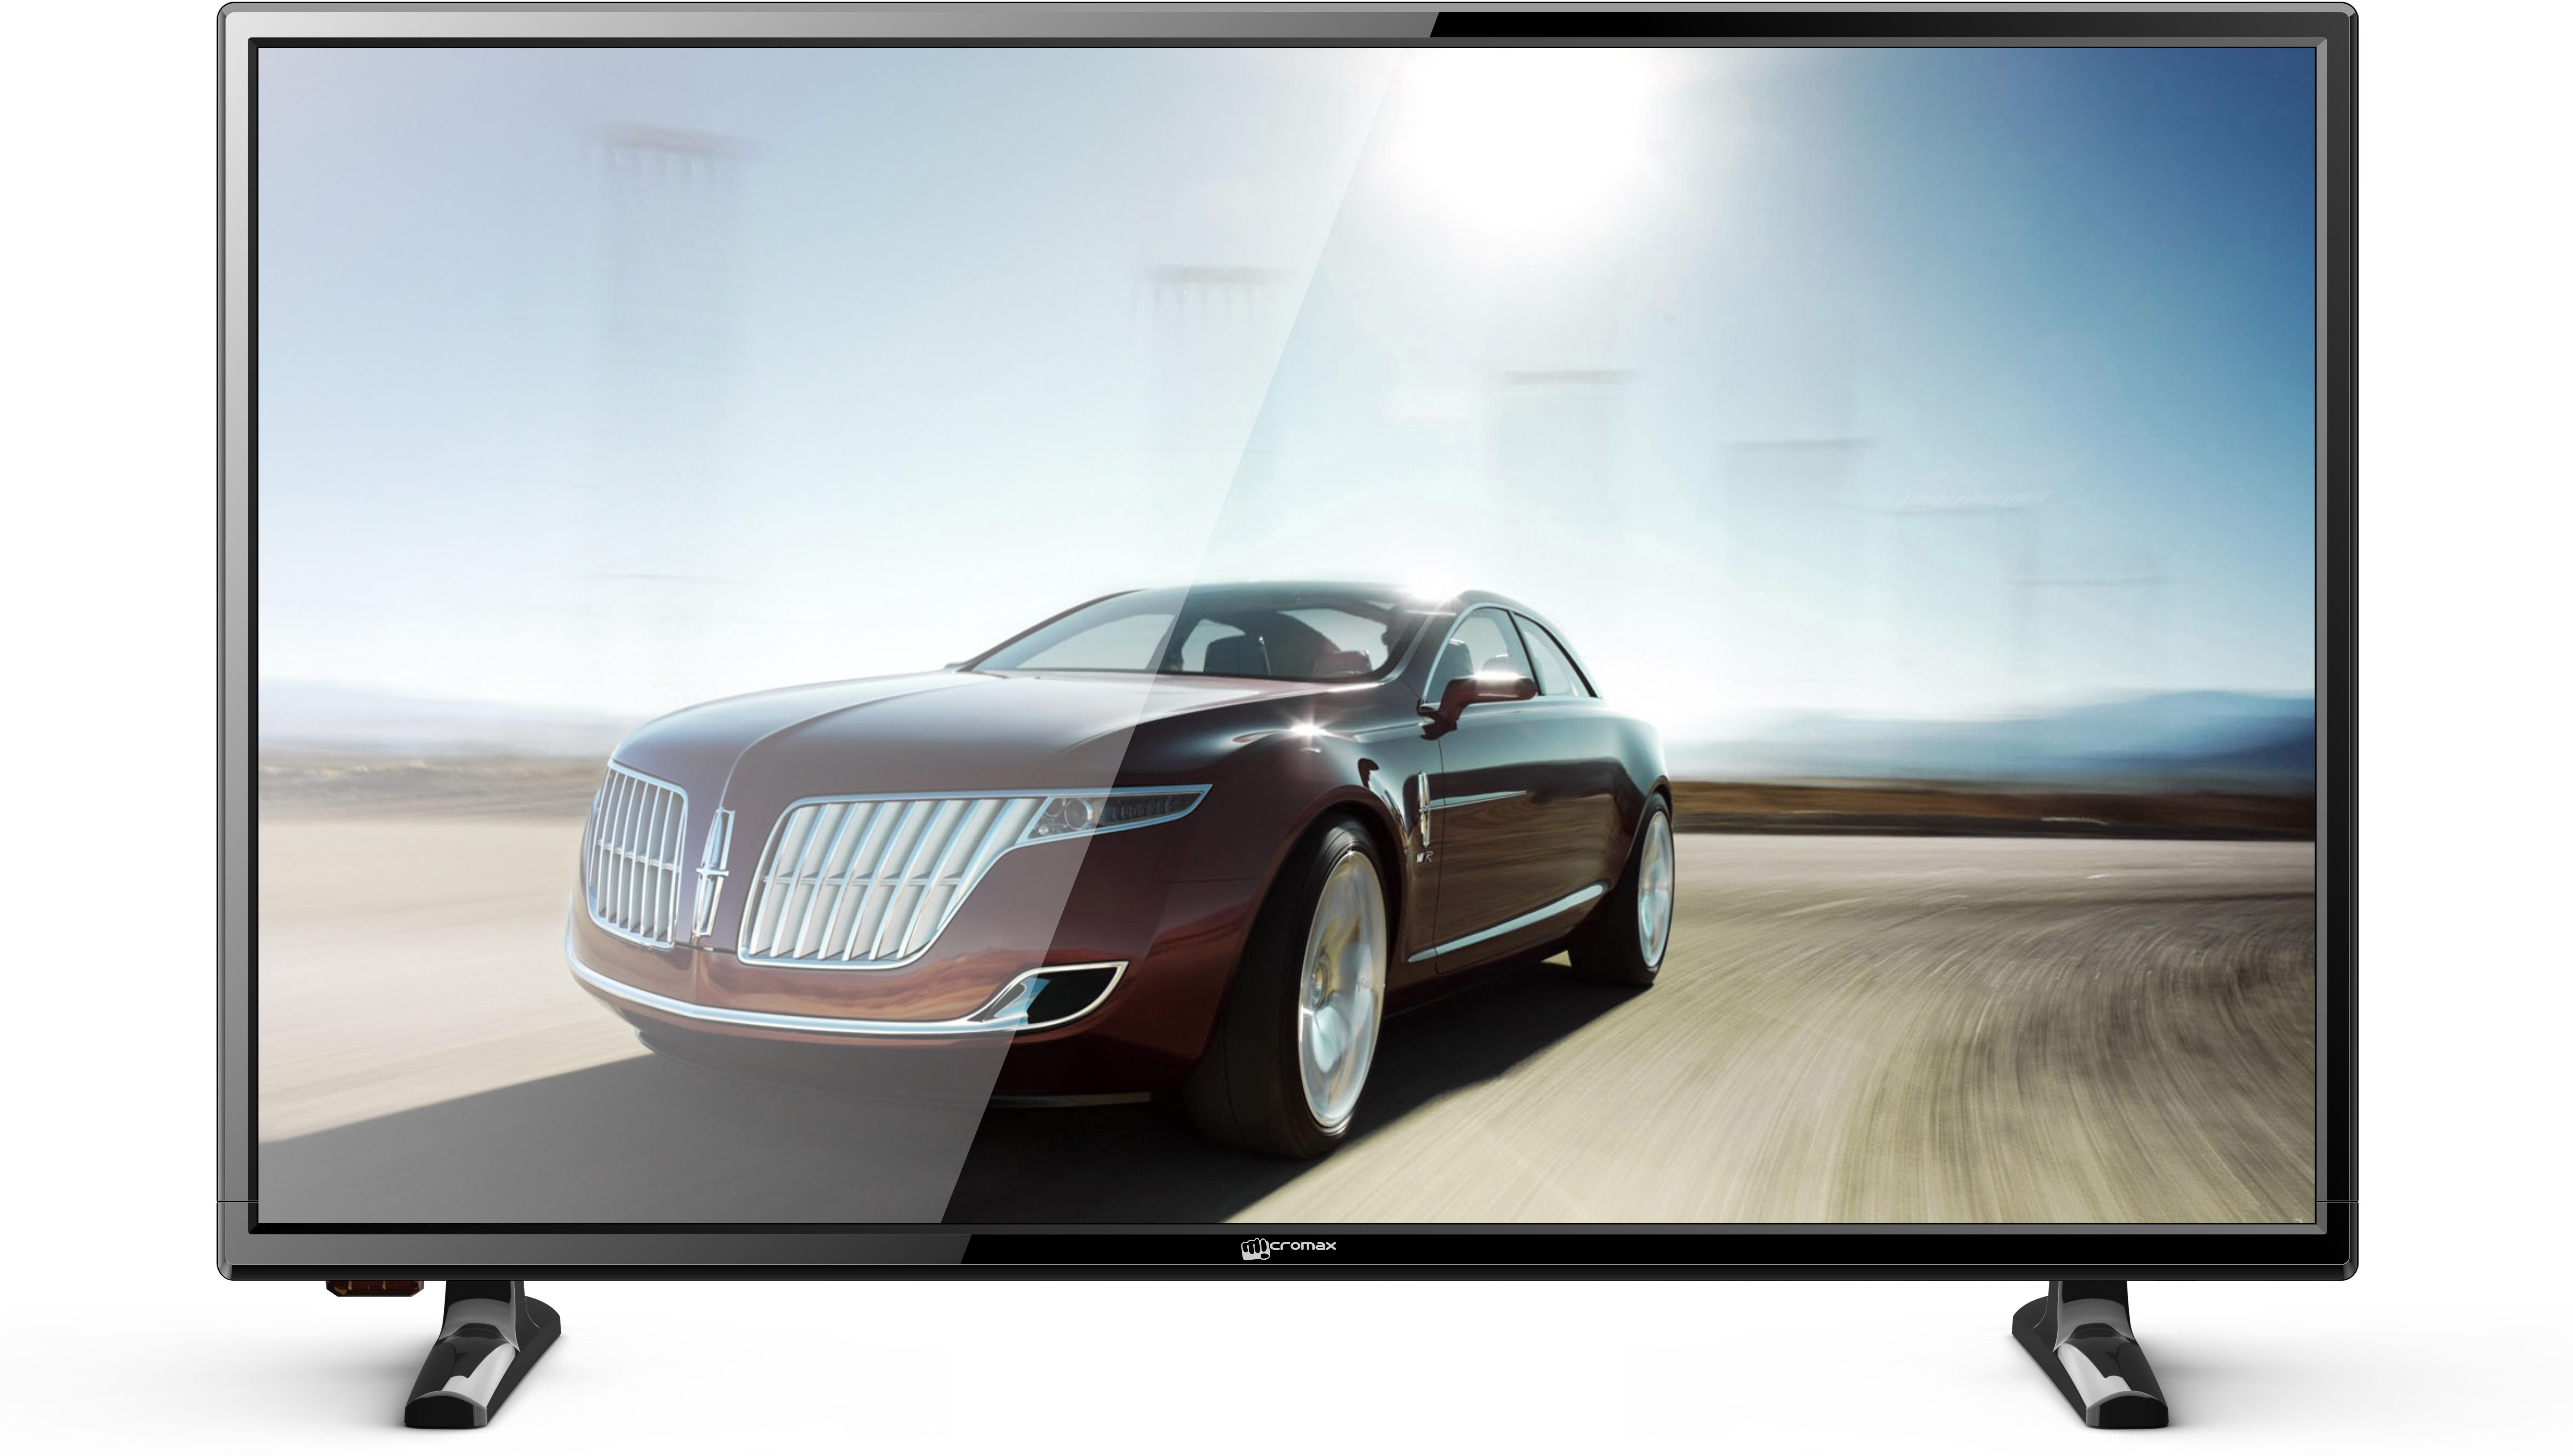 Deals | Starting Rs.8,990 60cm (24) and Below TVs